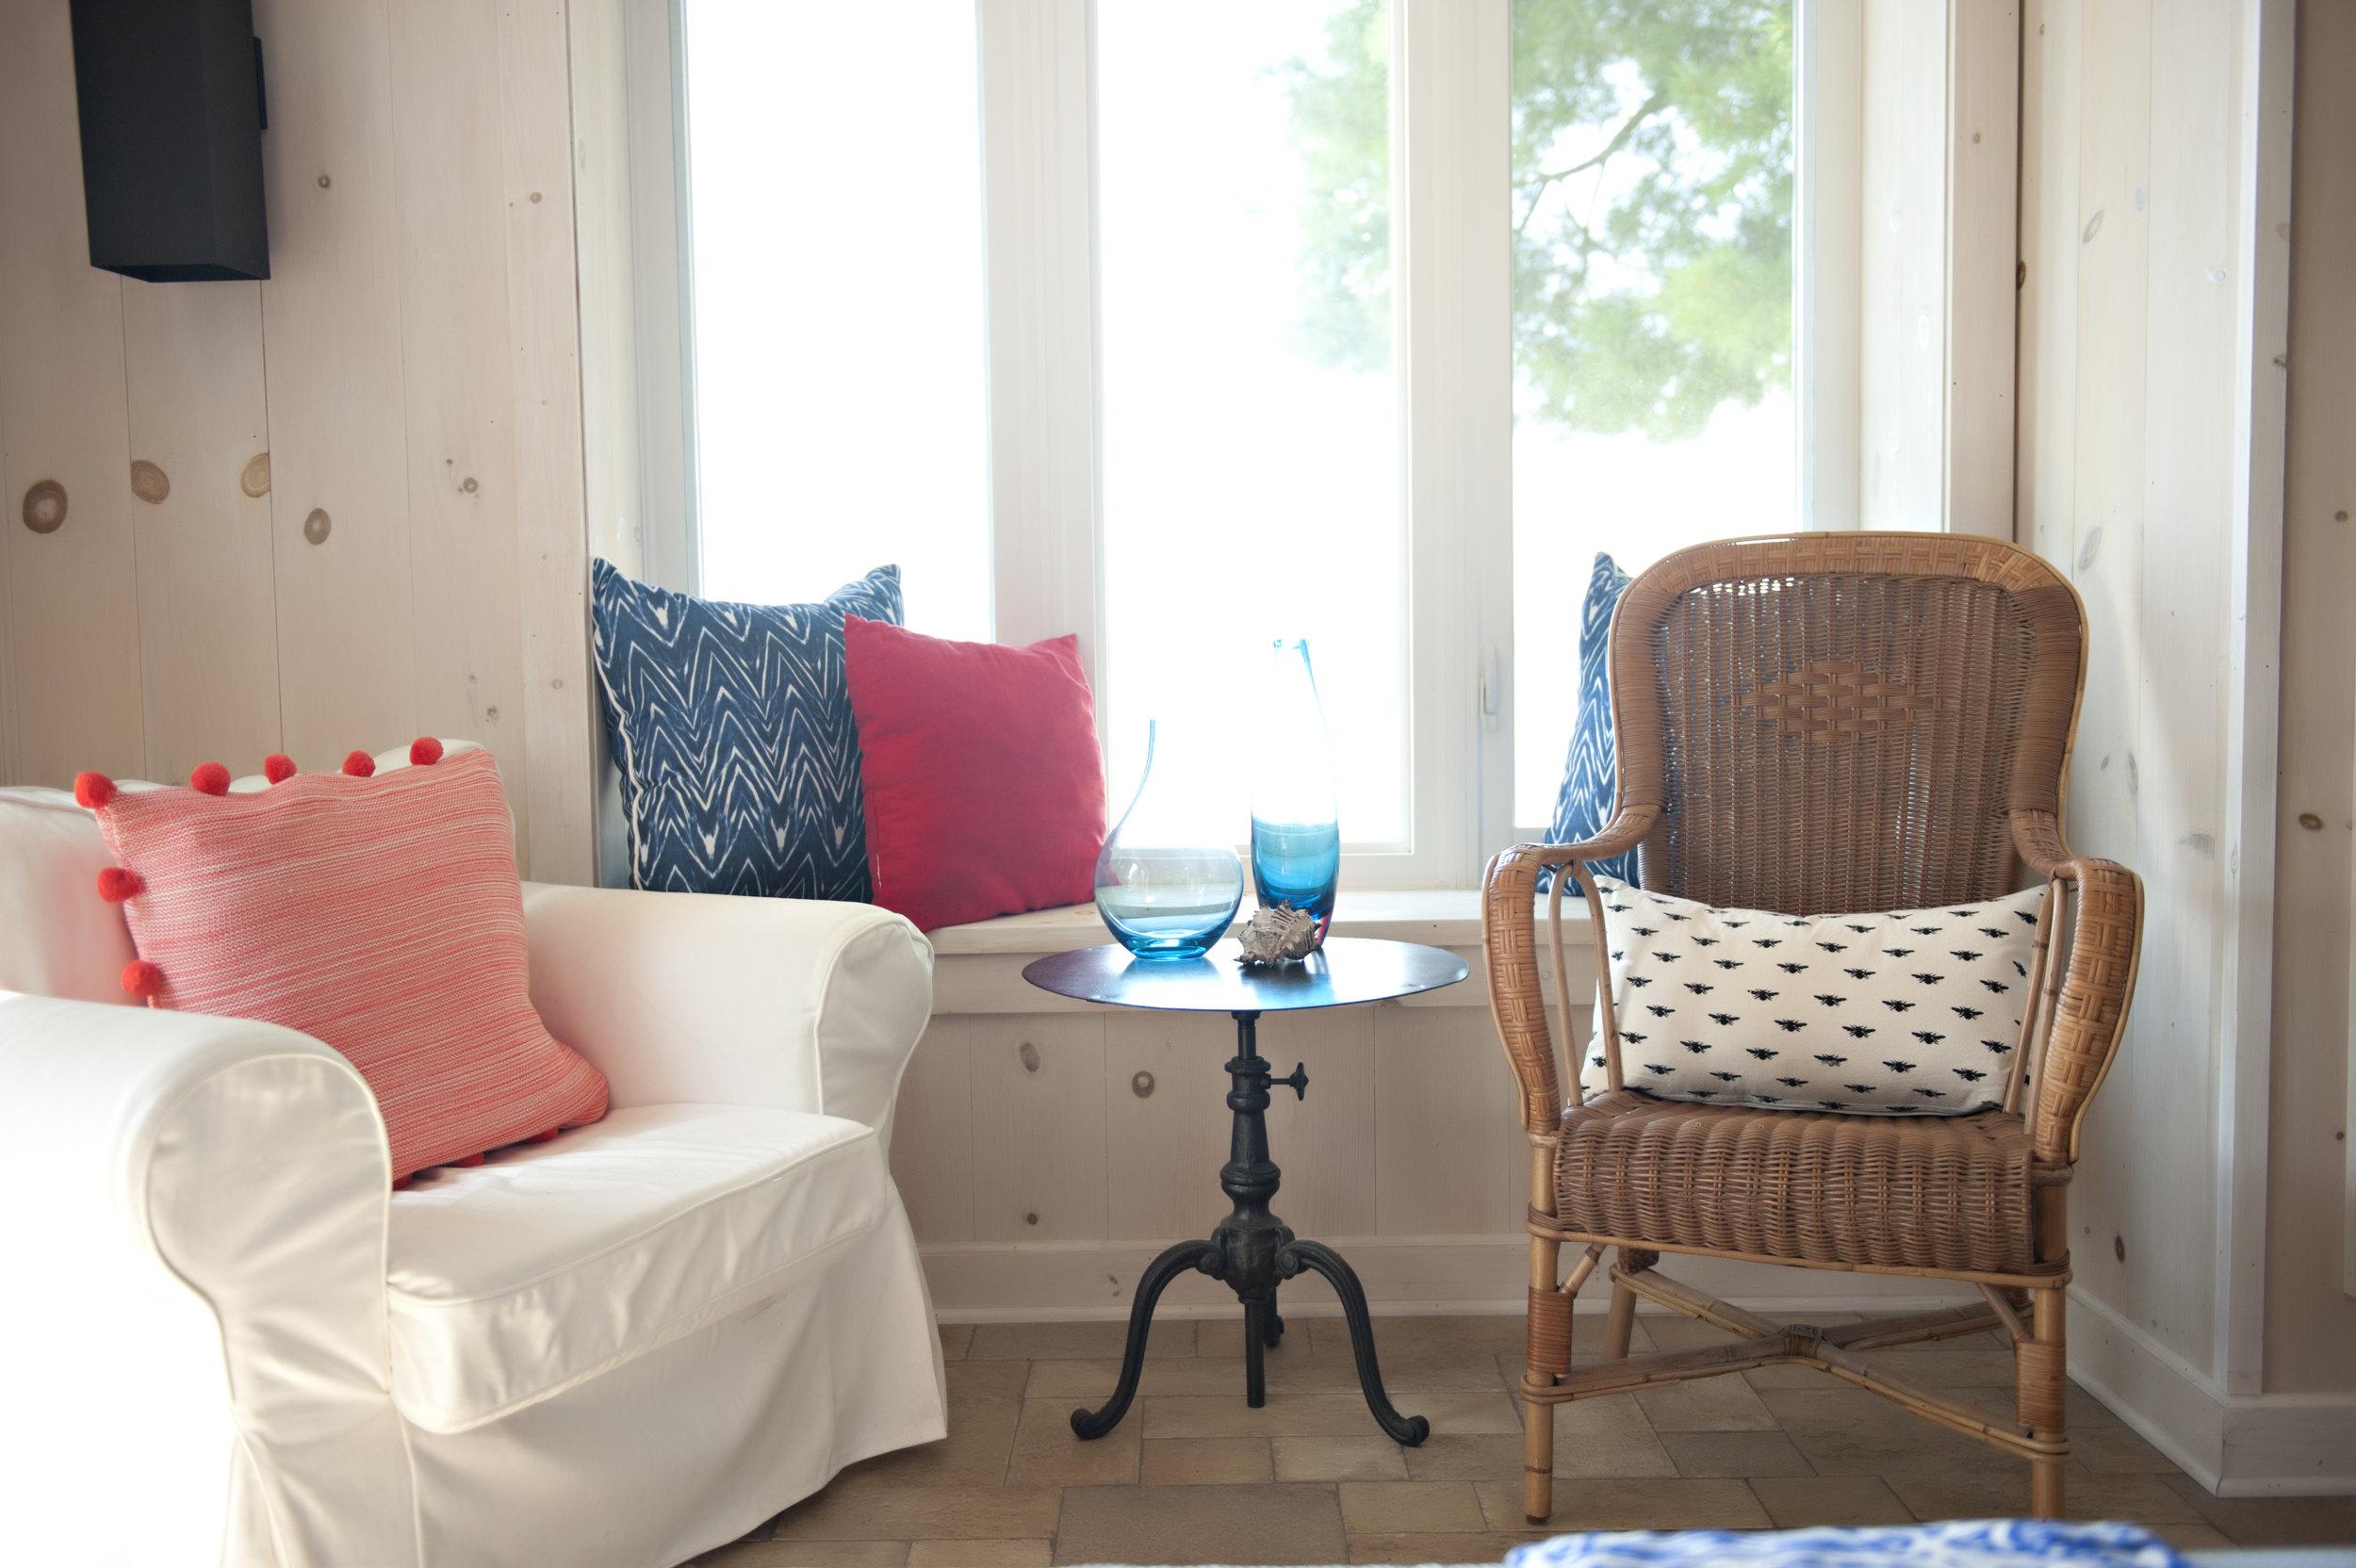 Candace-Plotz-Design-Beach-House-2-Slip-Cover-Wicker-Chair